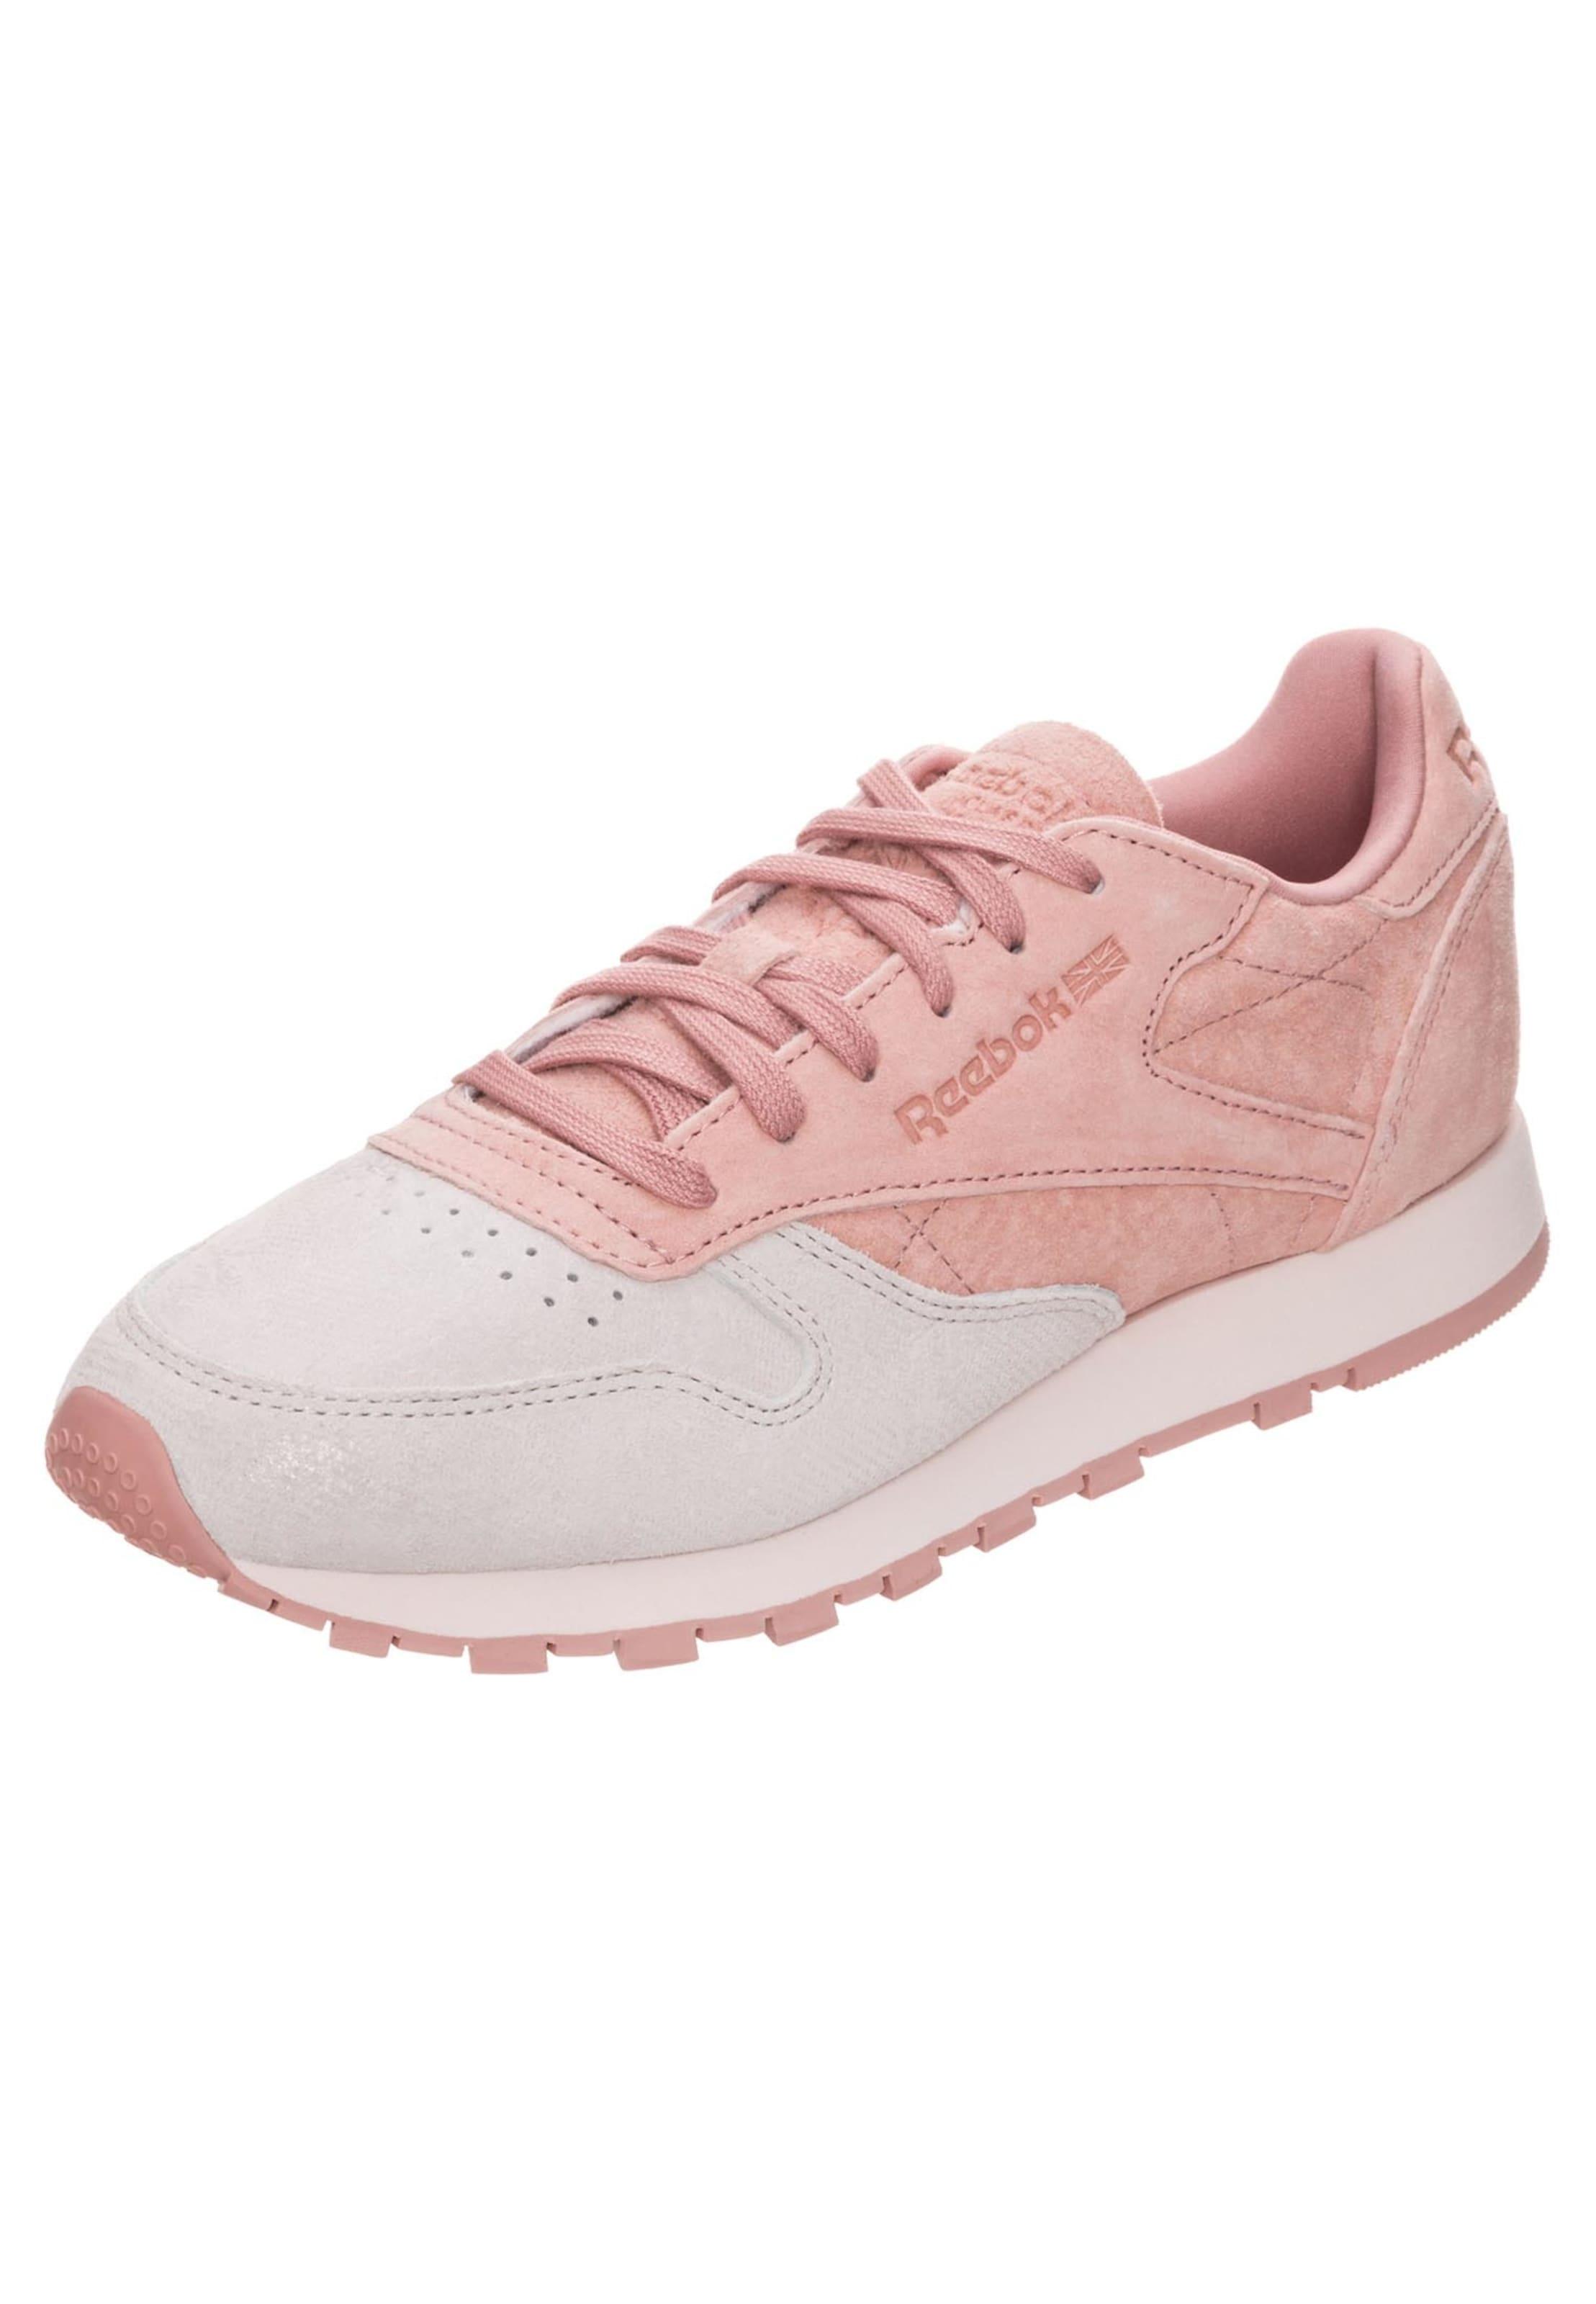 Sneaker Reebok Altrosa Leather Classic In Damen dQshtr